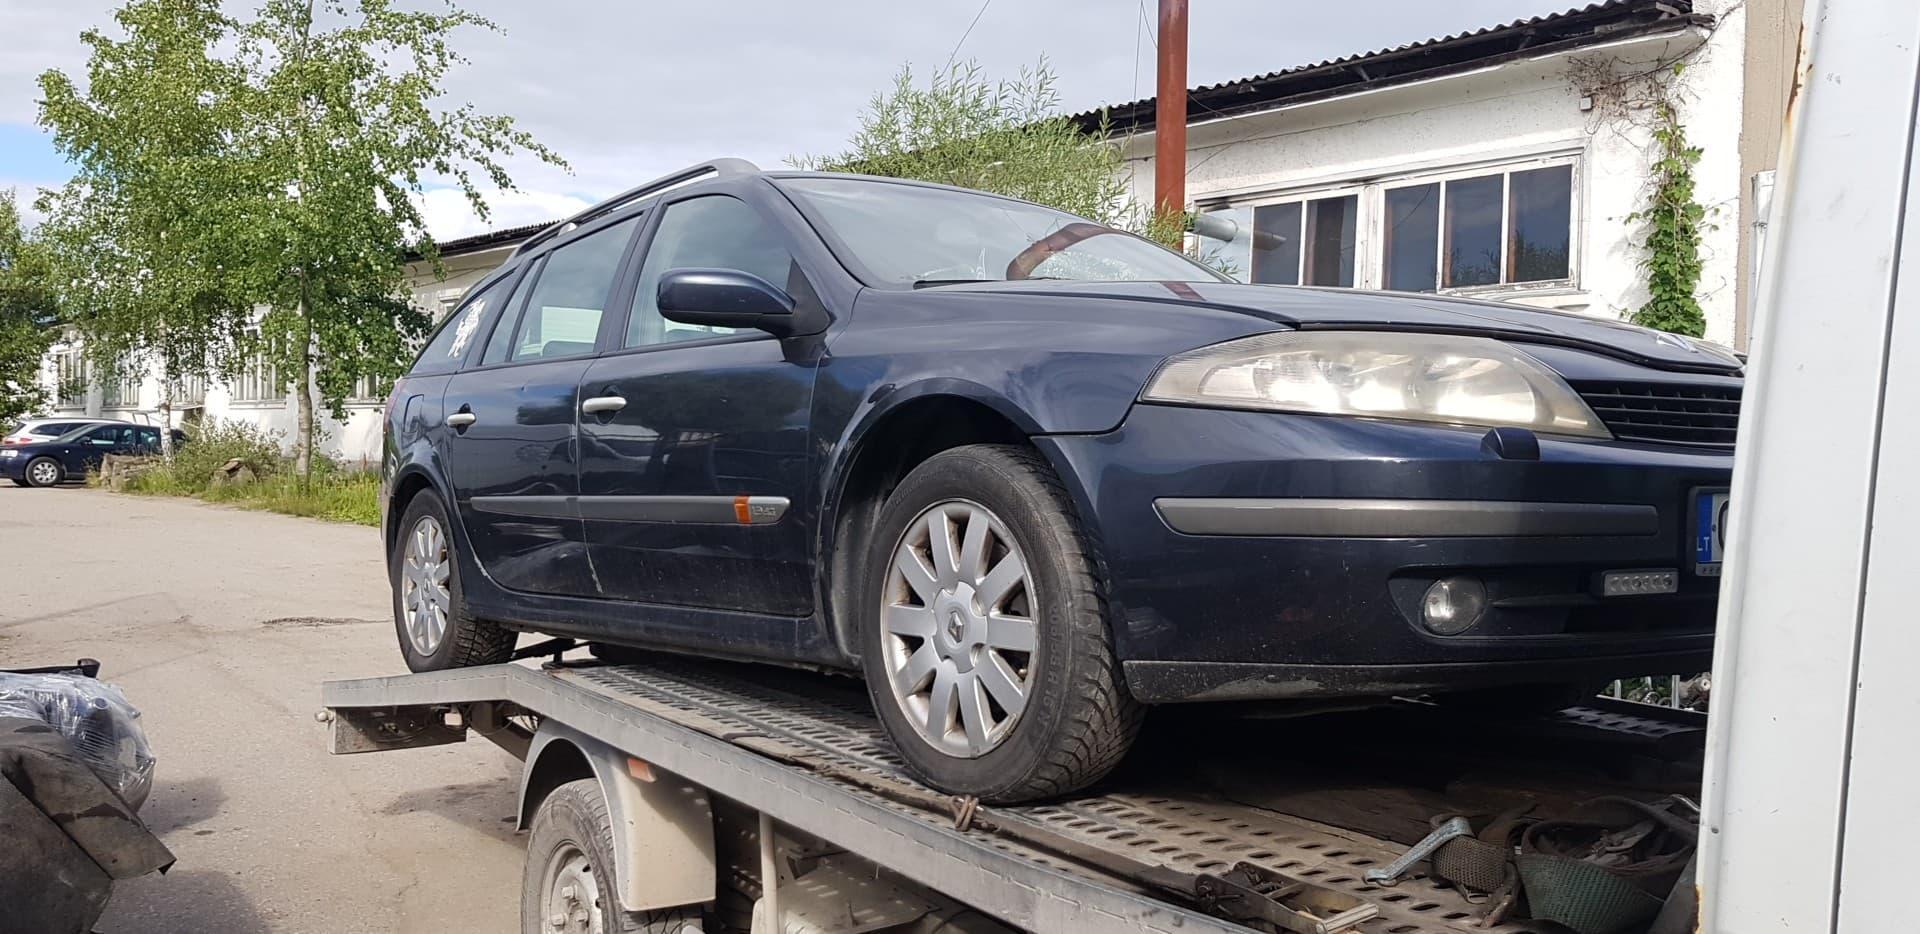 Used Car Parts Renault LAGUNA 2001 1.9 Mechanical Universal 4/5 d. Grey 2020-7-13